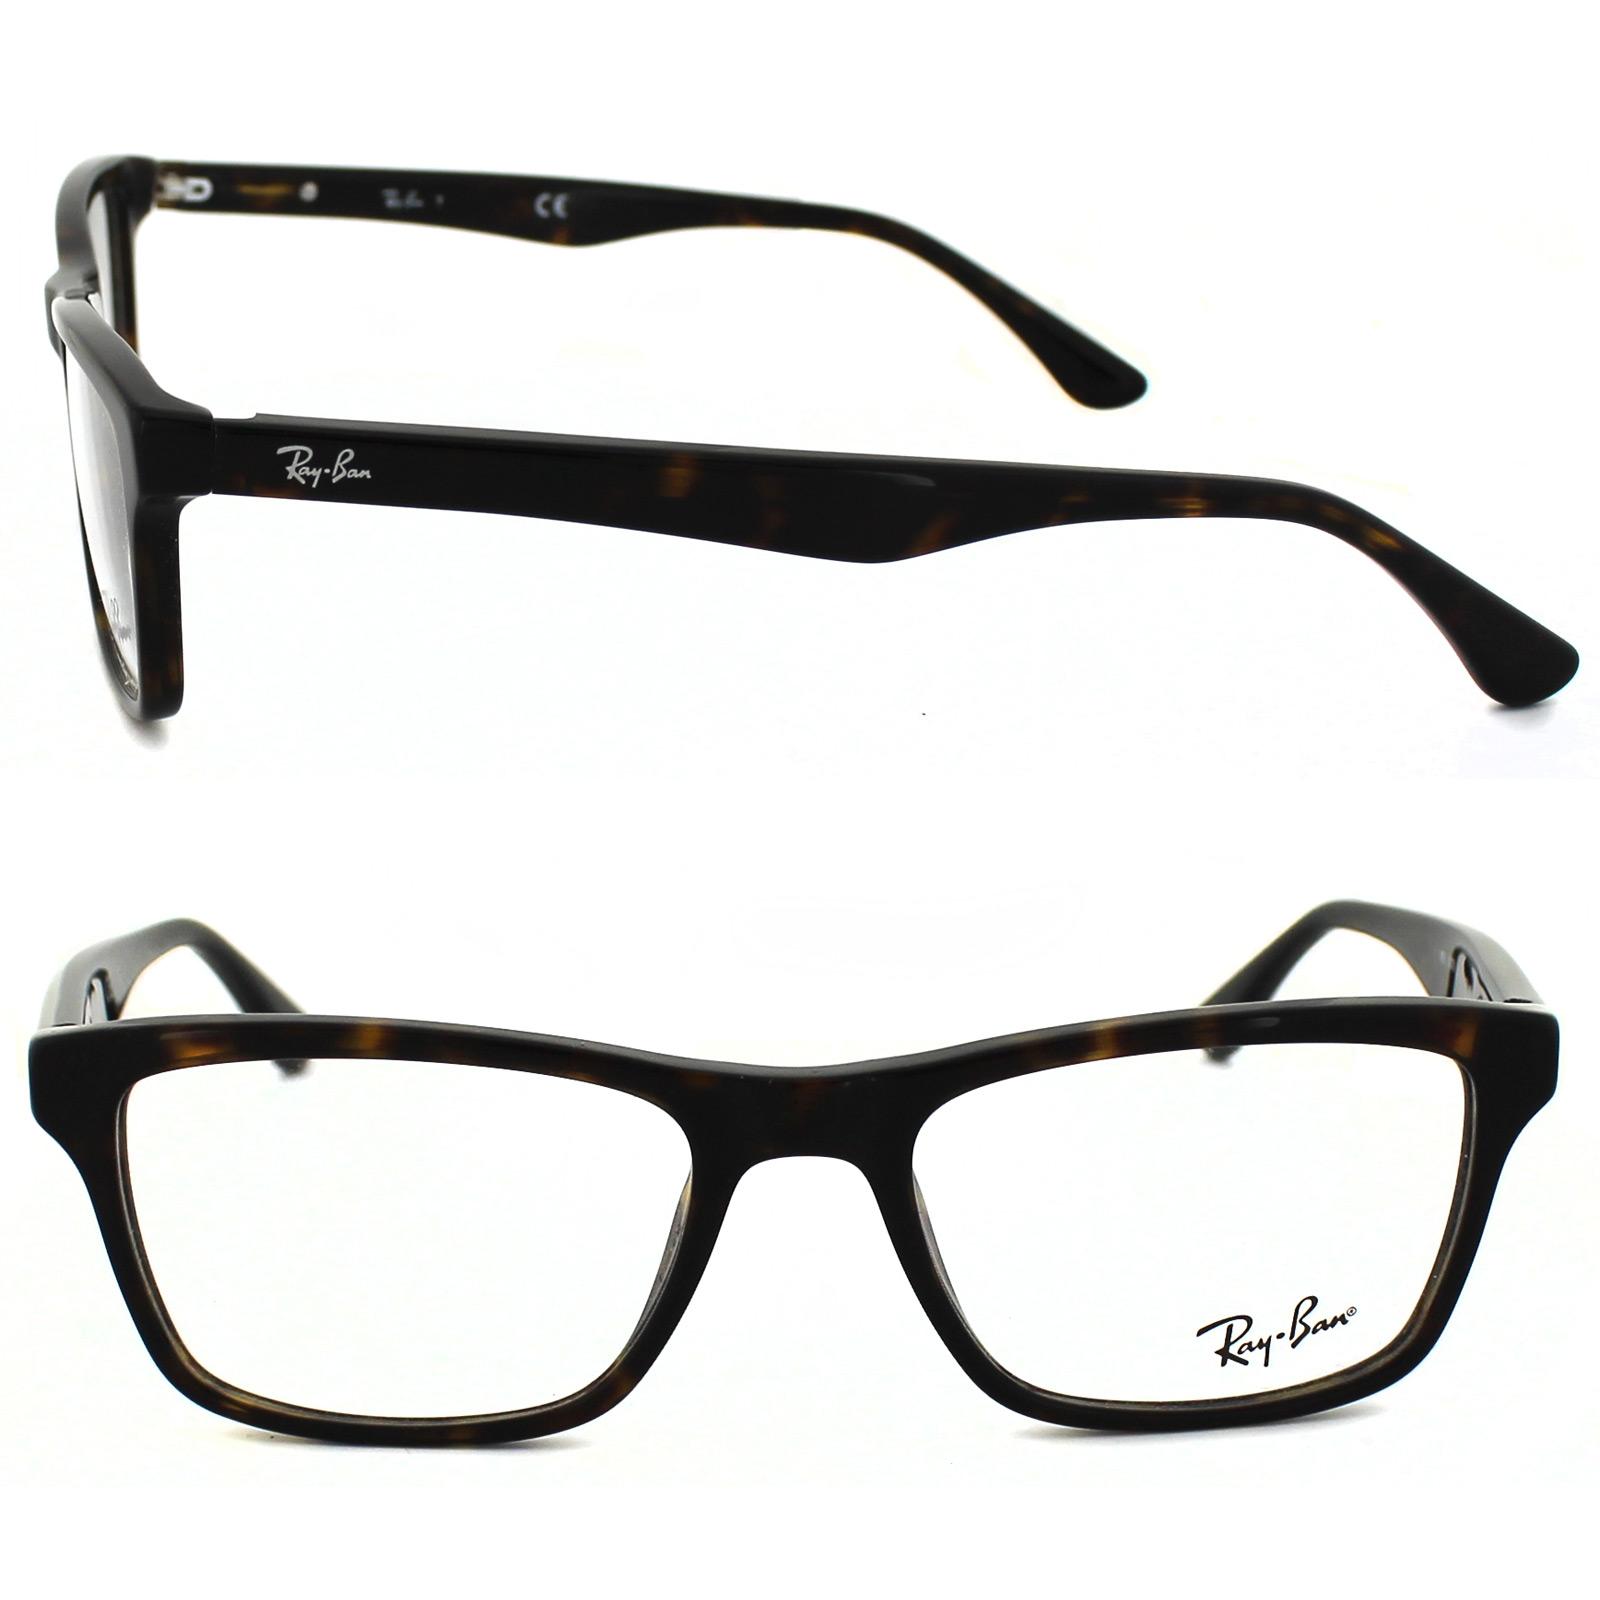 Ray Ban Glasses Frames Rx5279 : Ray-Ban Glasses Frames 5279 2012 Dark Havana eBay